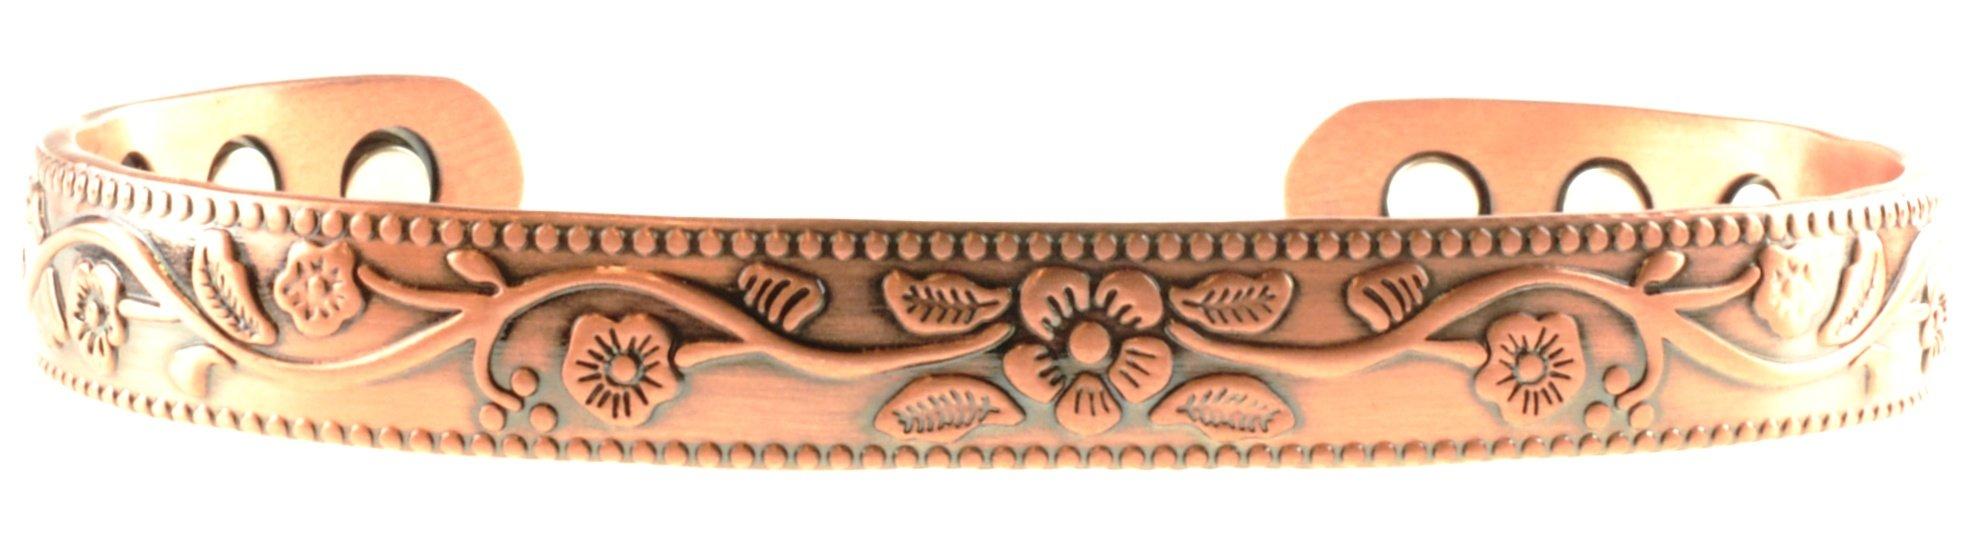 Elegant Stunning Copper Magnetic Bracelet with Unique Elderflower Flower Design Brass Bangle For Arthritis; Magnetic Copper Bracelet Therapy